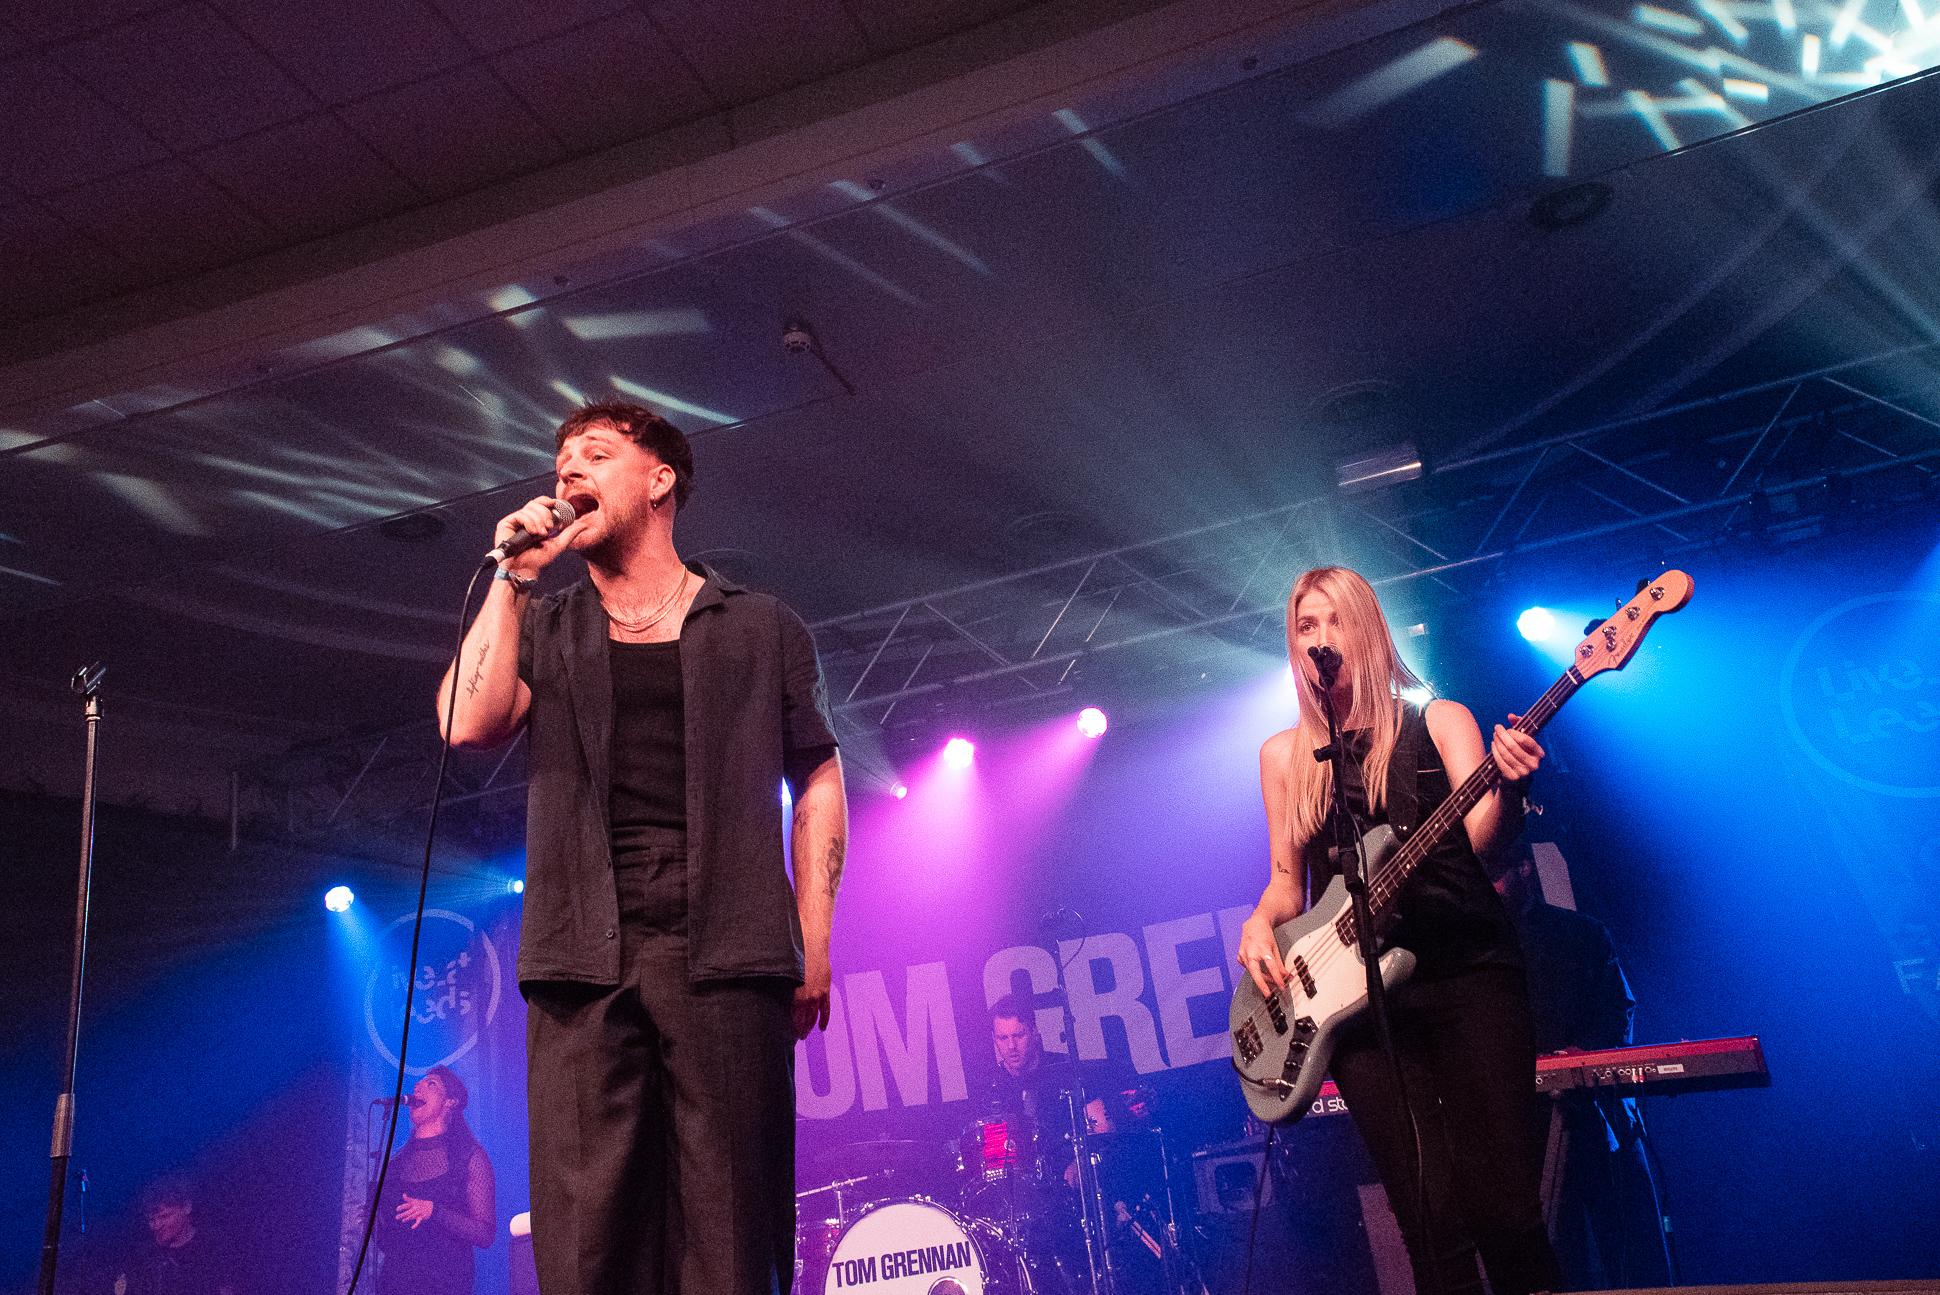 Live At Leeds 2019 - Tom Grennan_-9.jpg